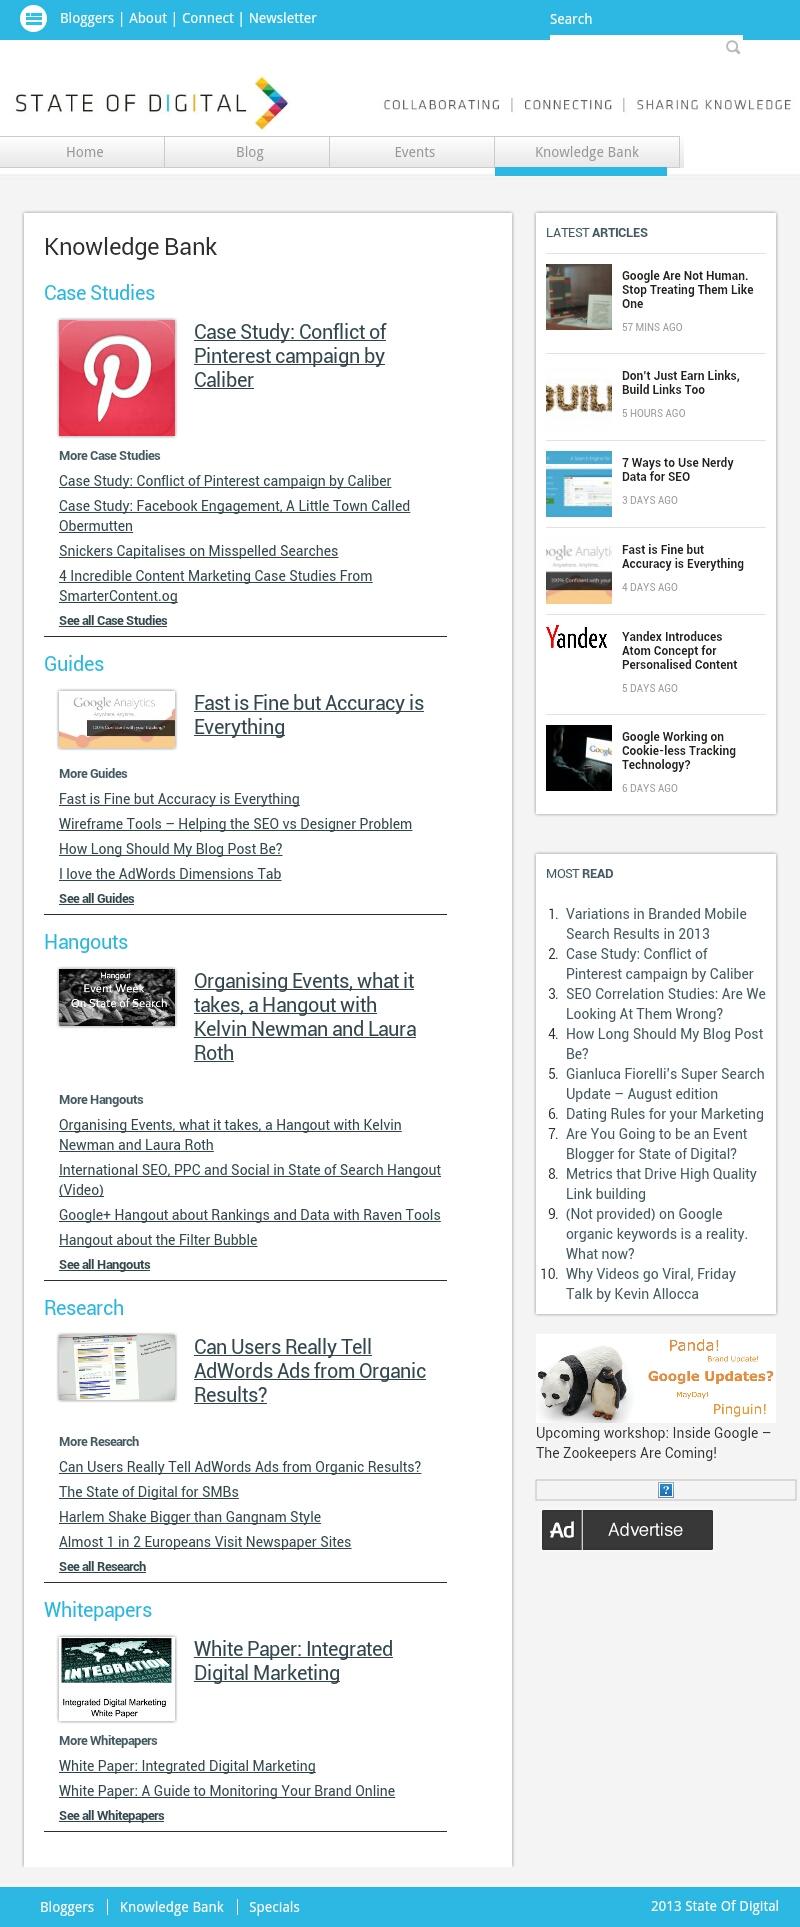 stateofdigital-tablet-knowledgebank